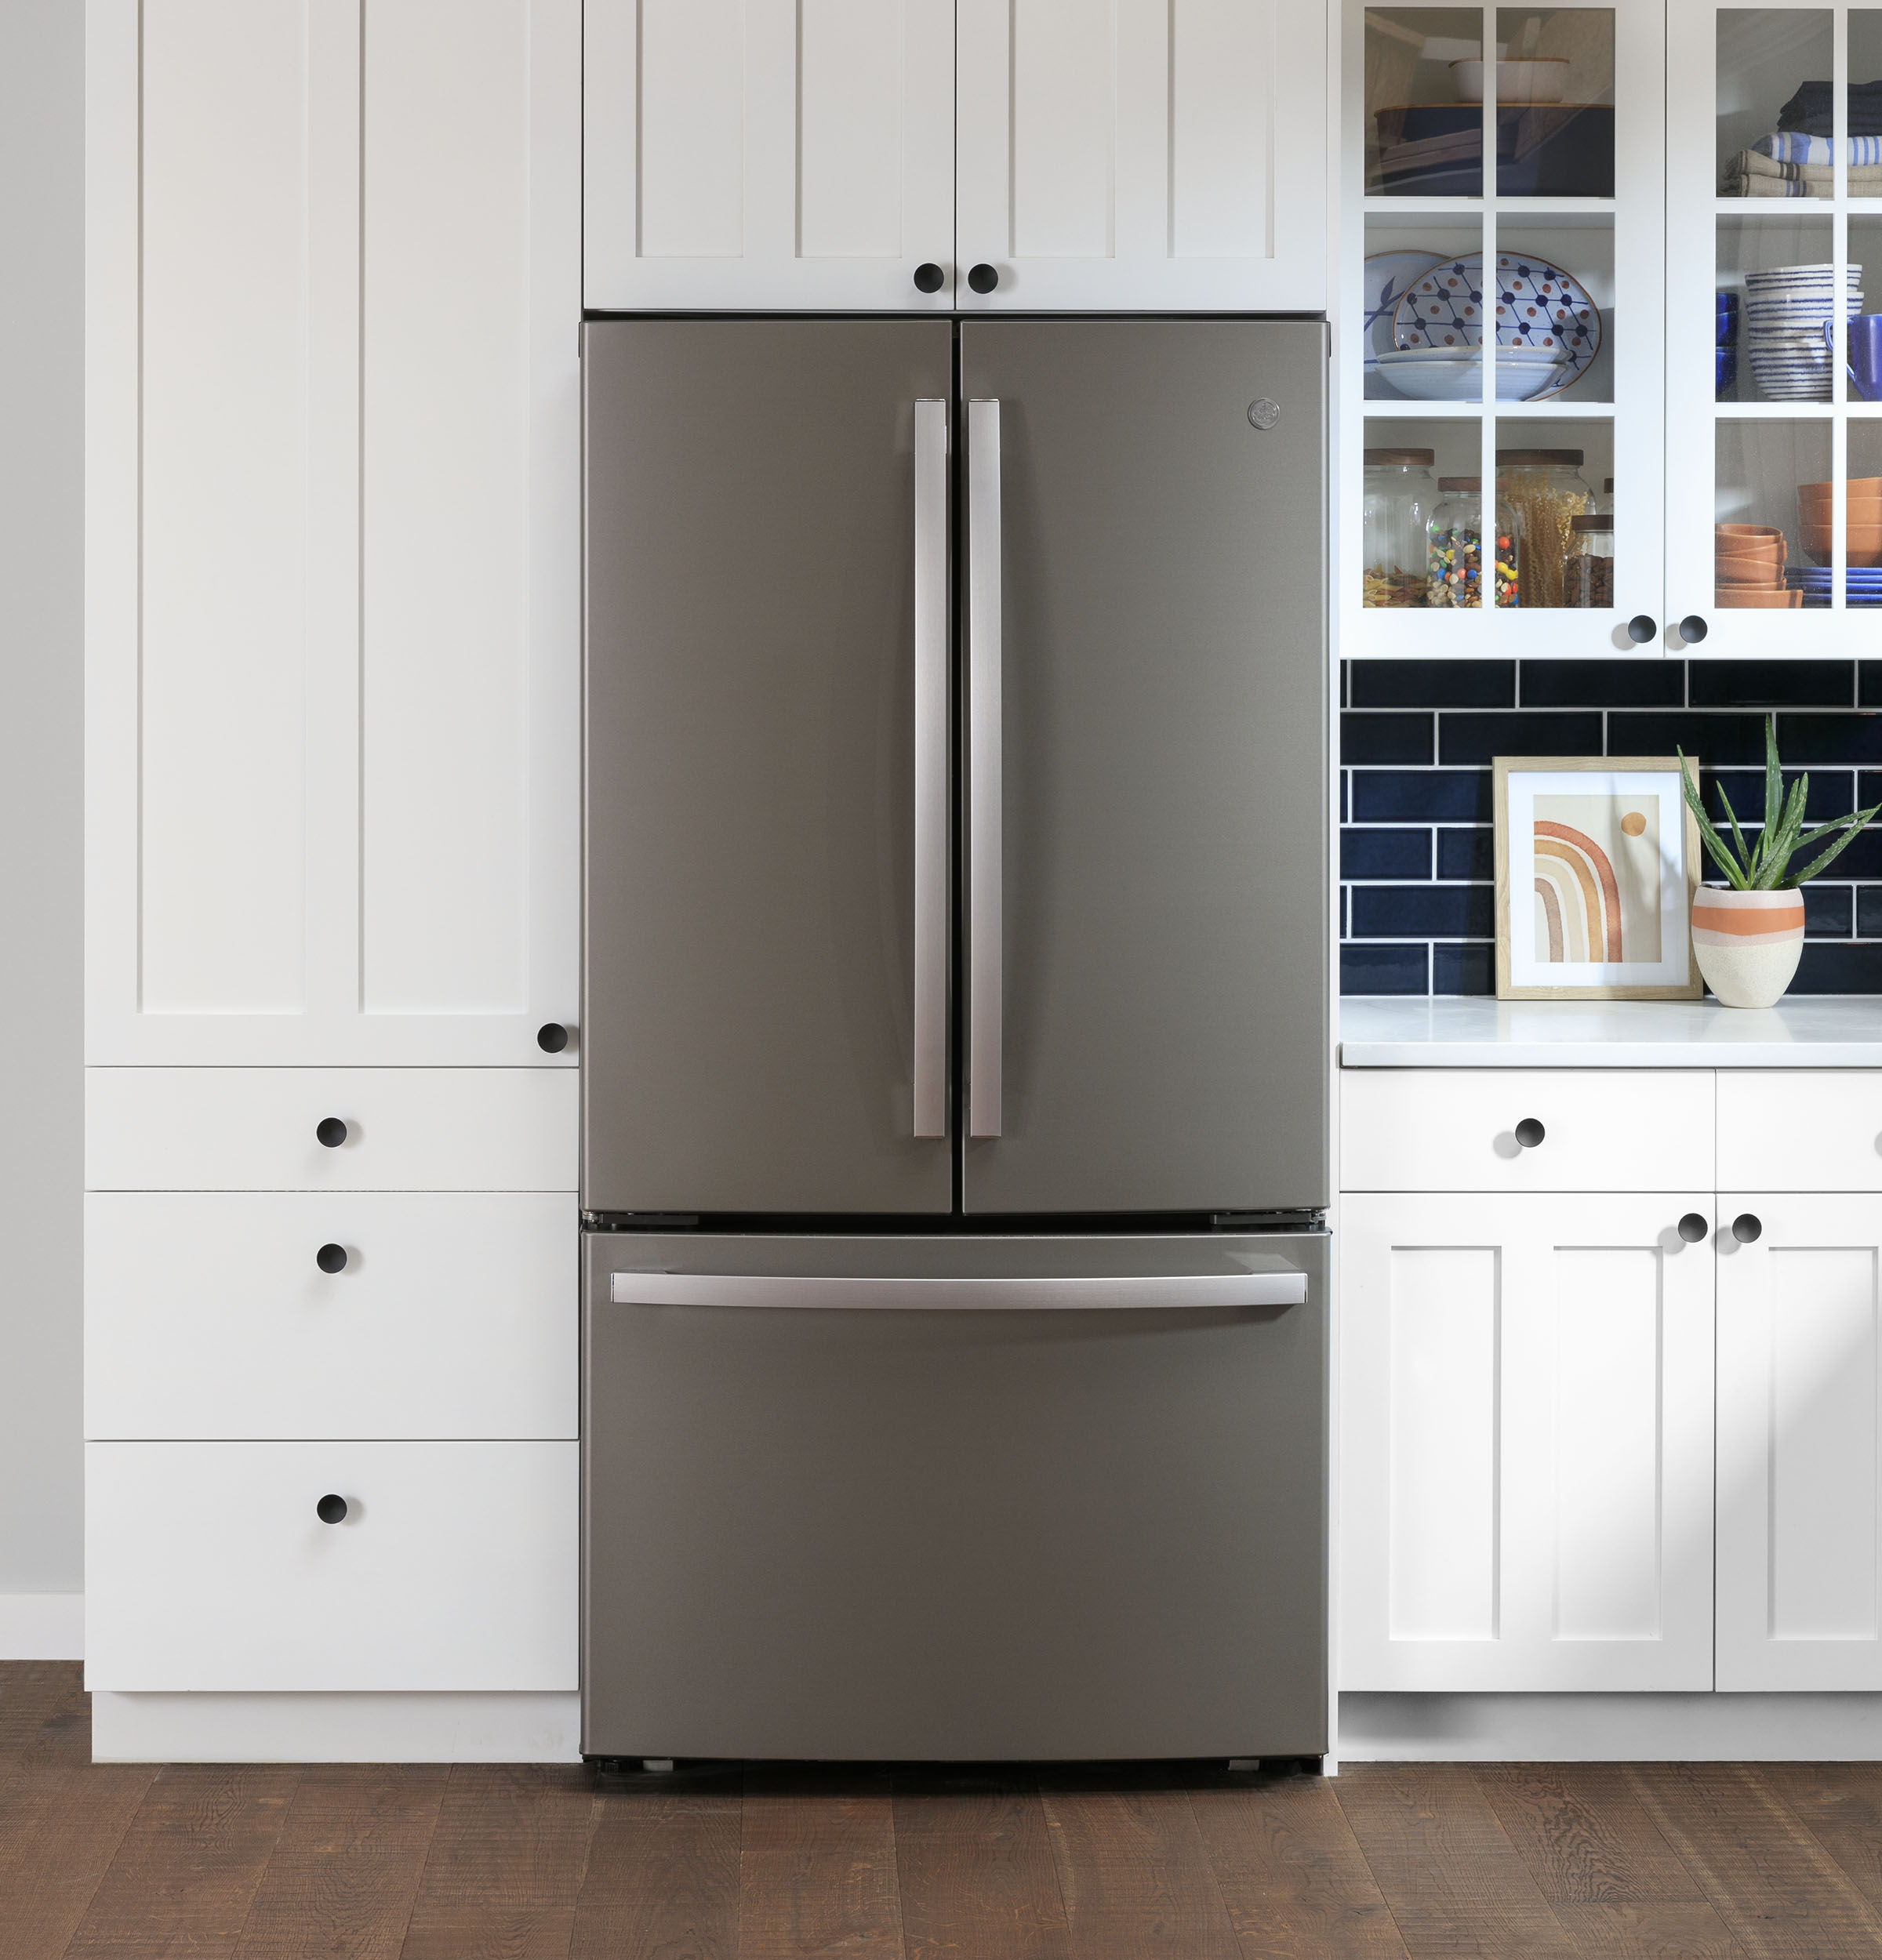 Model: GWE23GMNES | GE GE® ENERGY STAR® 23.1 Cu. Ft. Counter-Depth French-Door Refrigerator